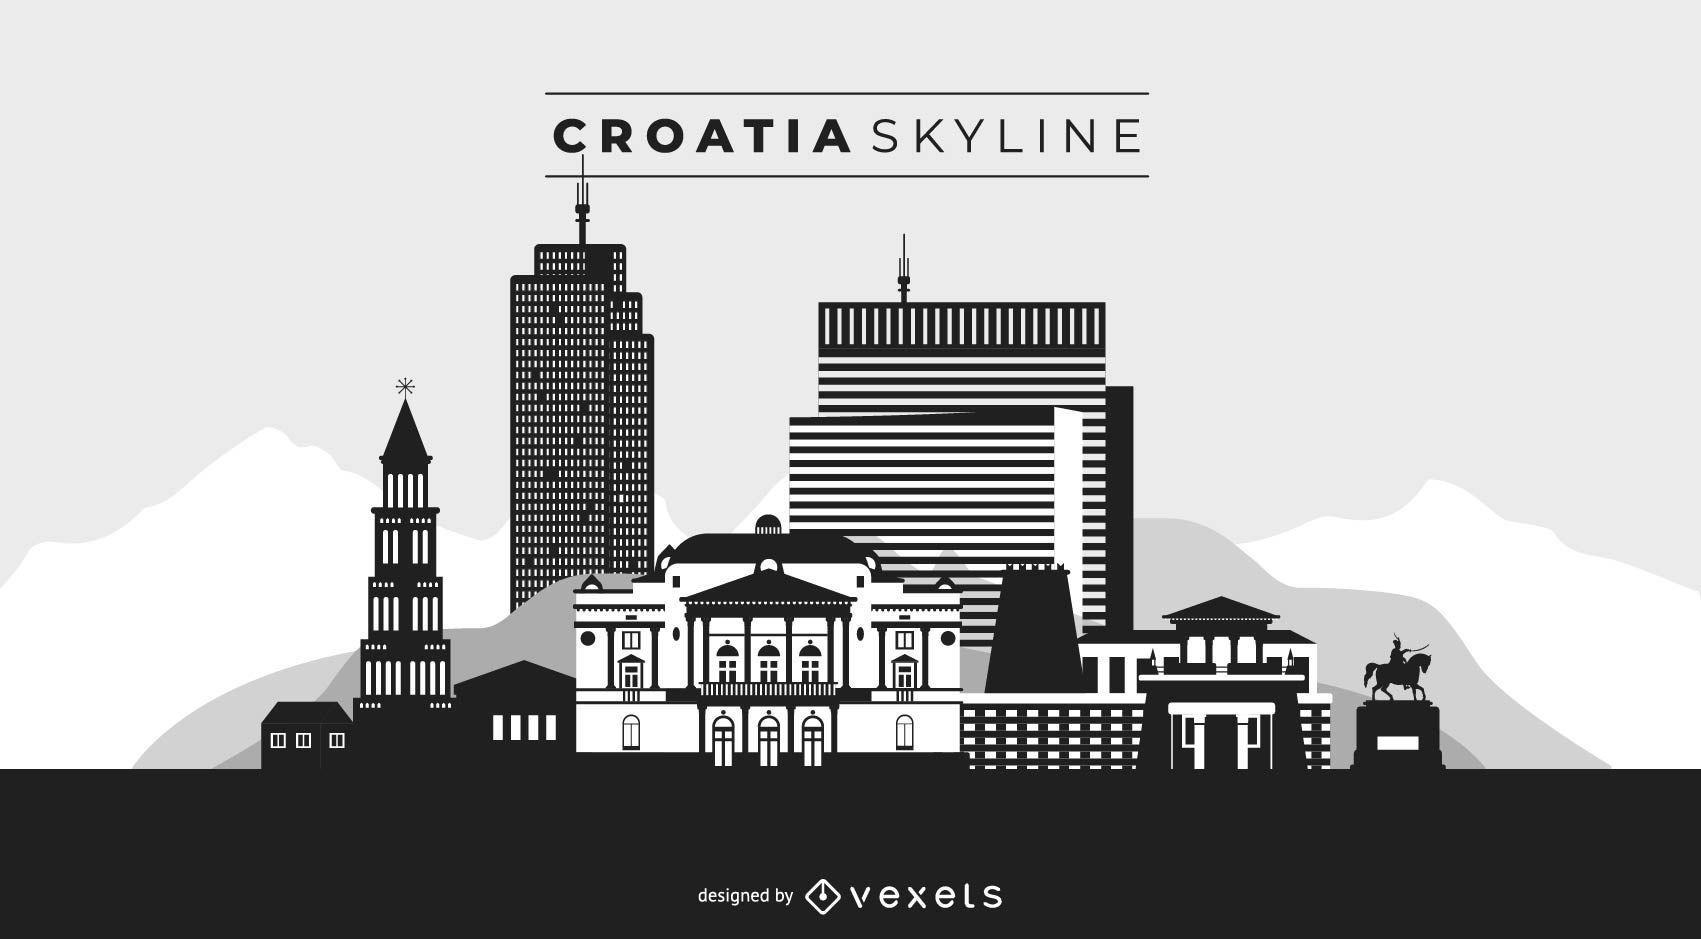 Croatia skyline black and white